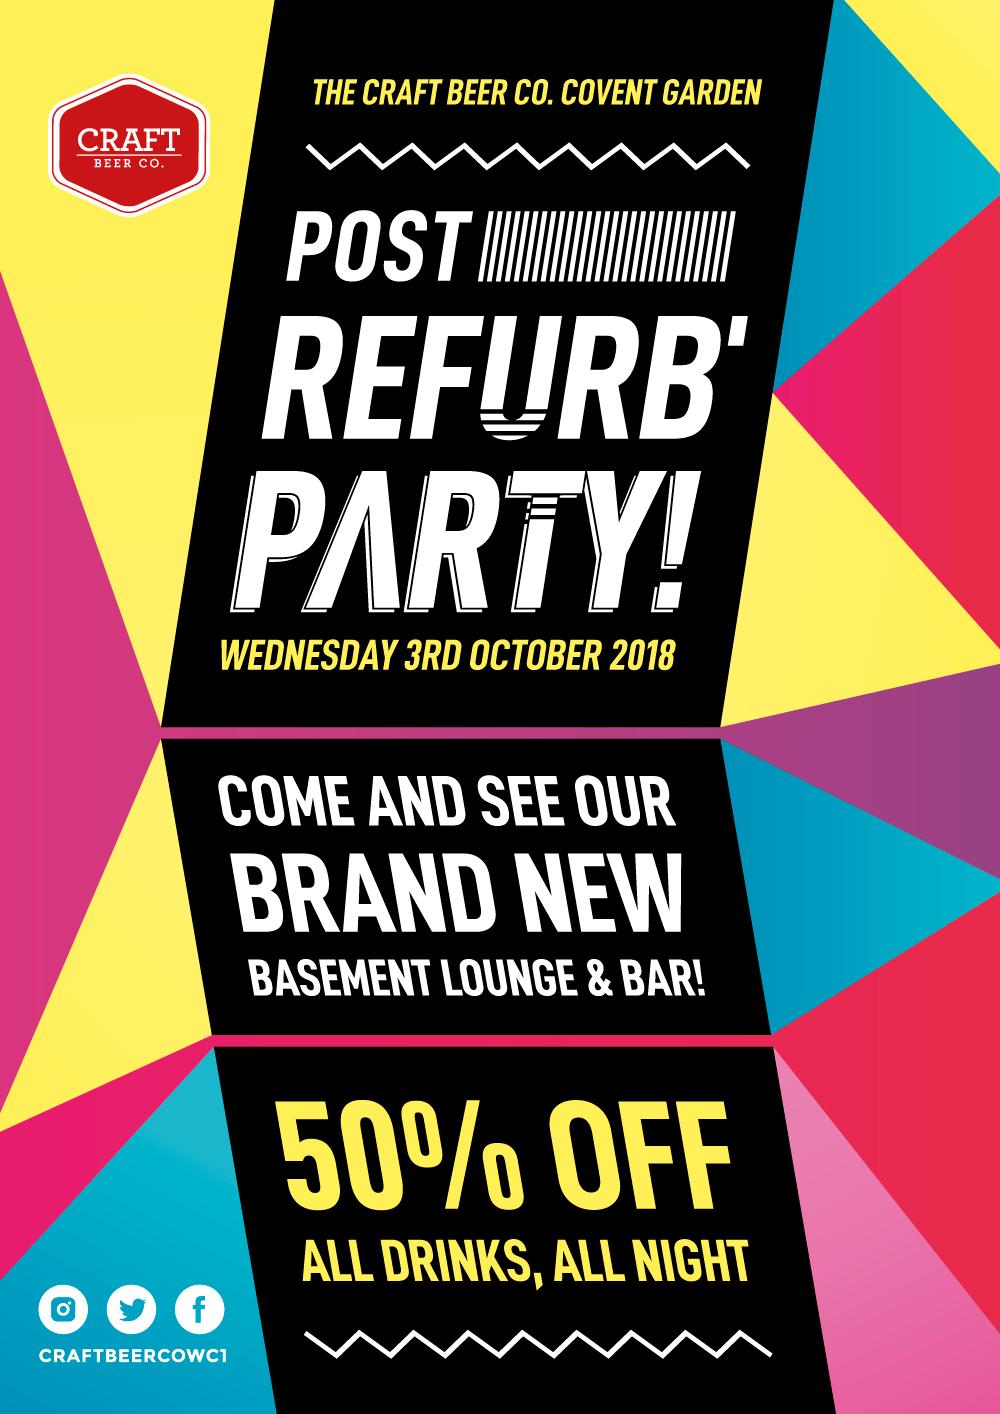 post-refurb-party-2018-social-1.jpg